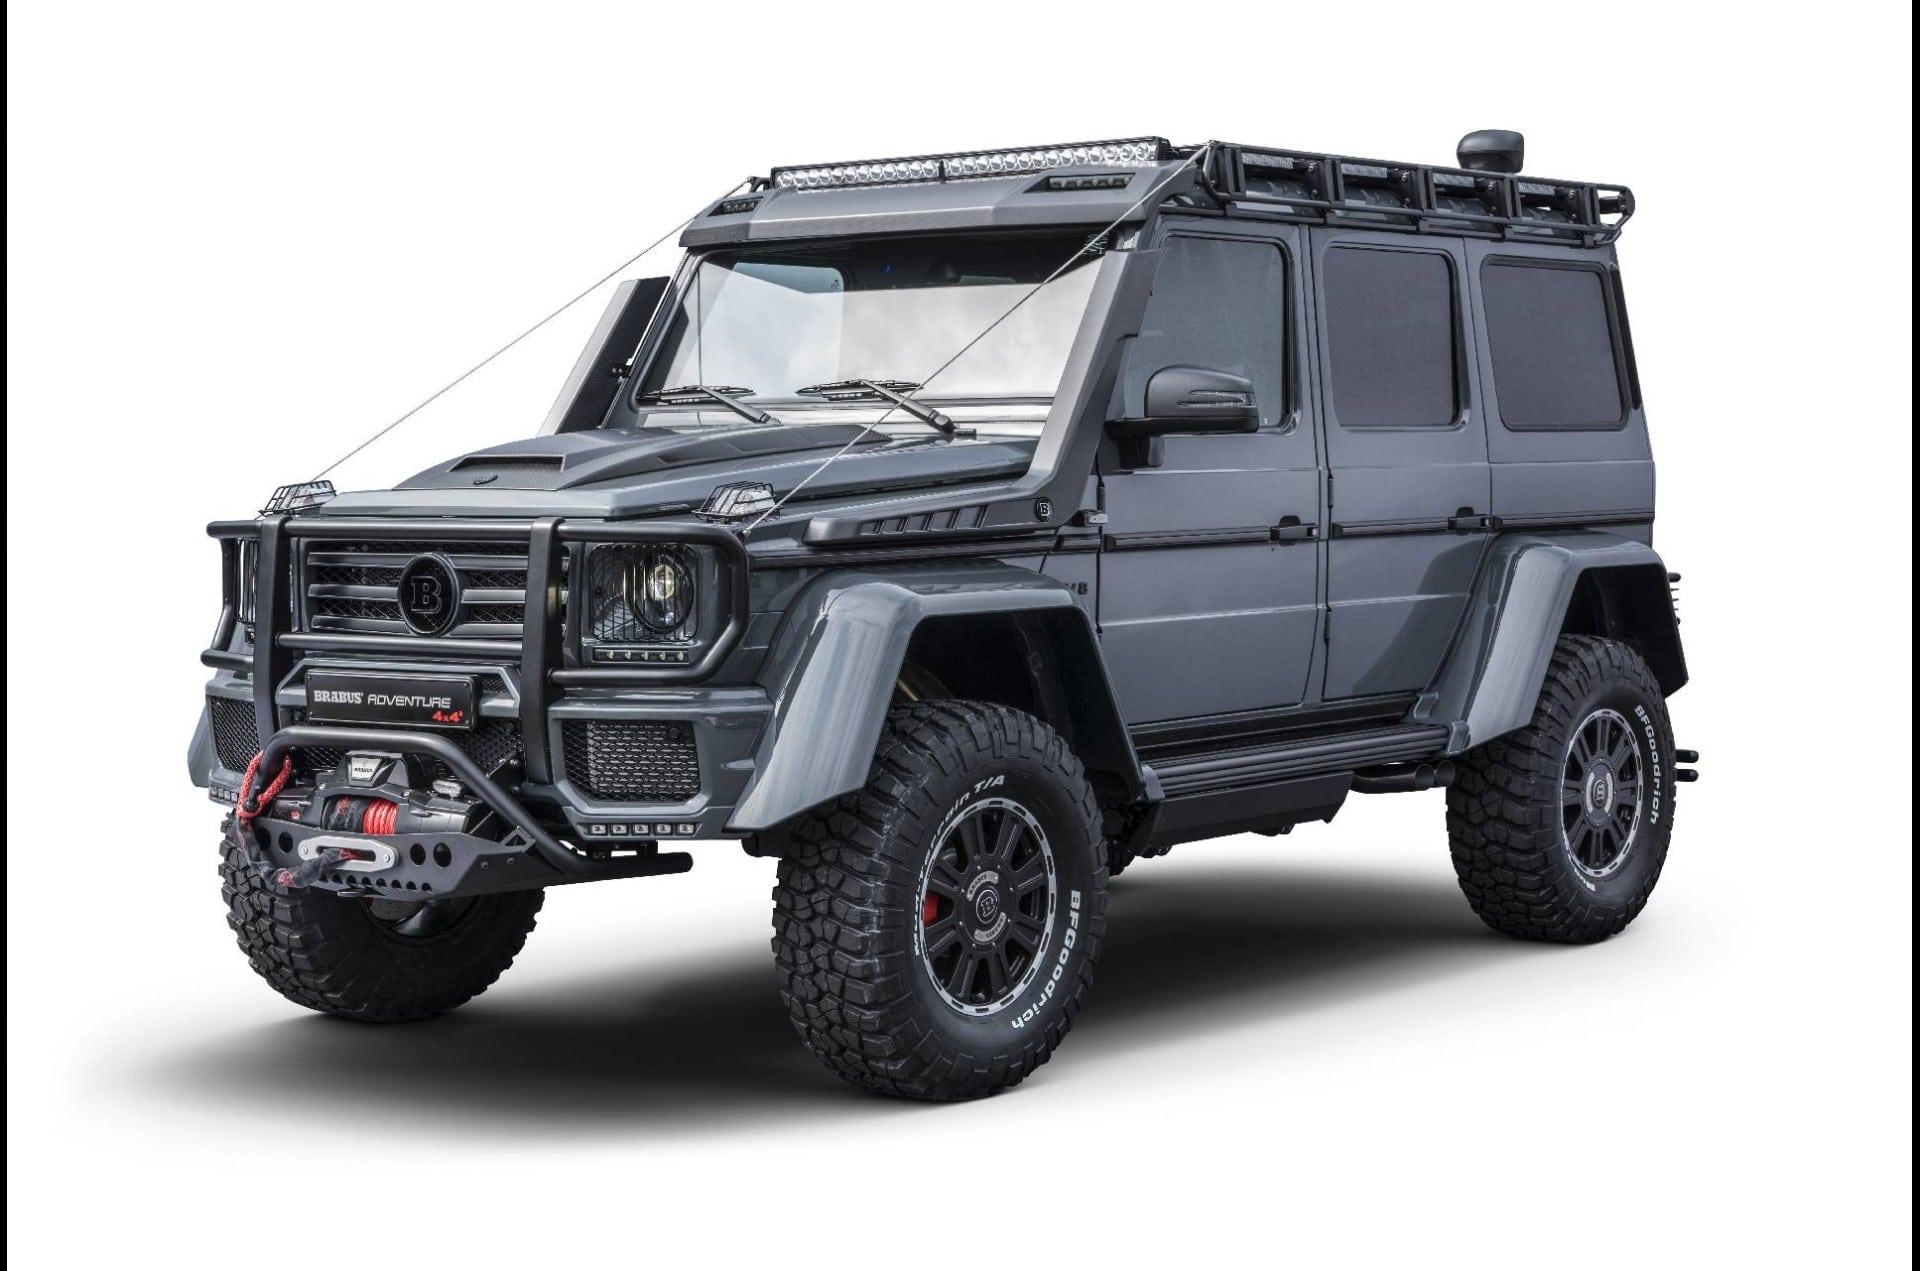 Brabus G500 4×4 Adventure